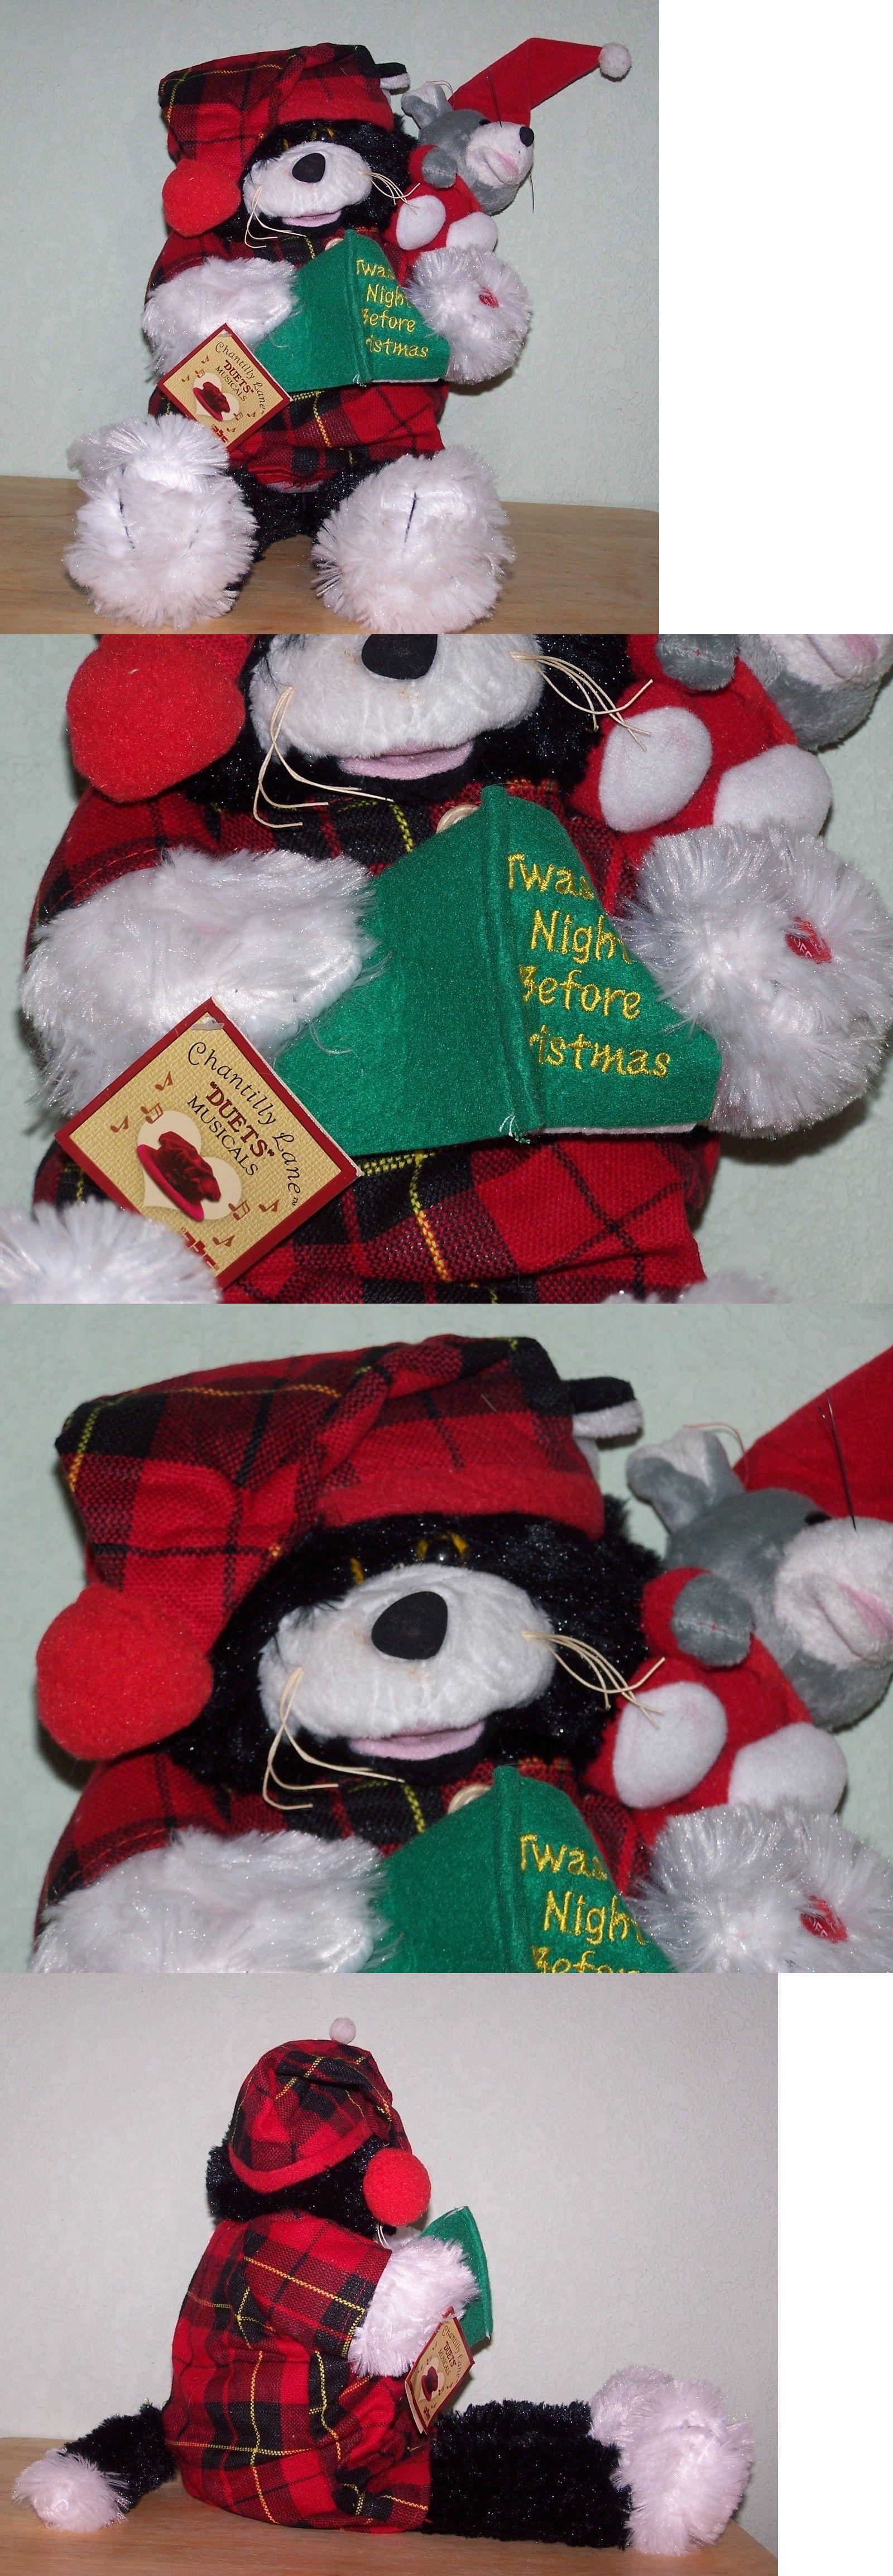 Talking Toys 145945 Twas The Night Before Christmas Plush